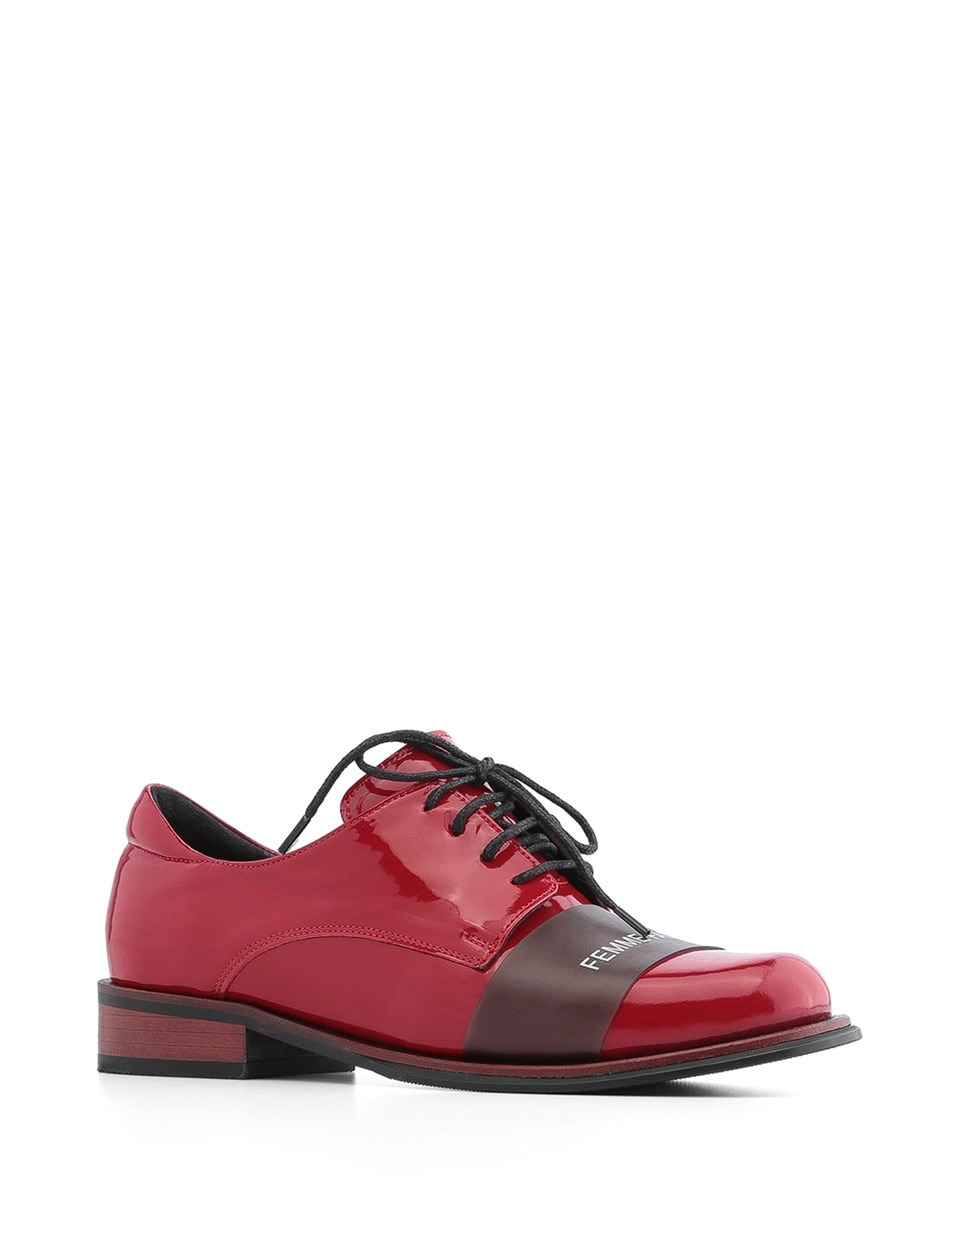 ILVi-Genuine Leather Handmade Fishnet Women's Oxford Red Women Shoes 2020 Spring Summer (Made in Turkey)